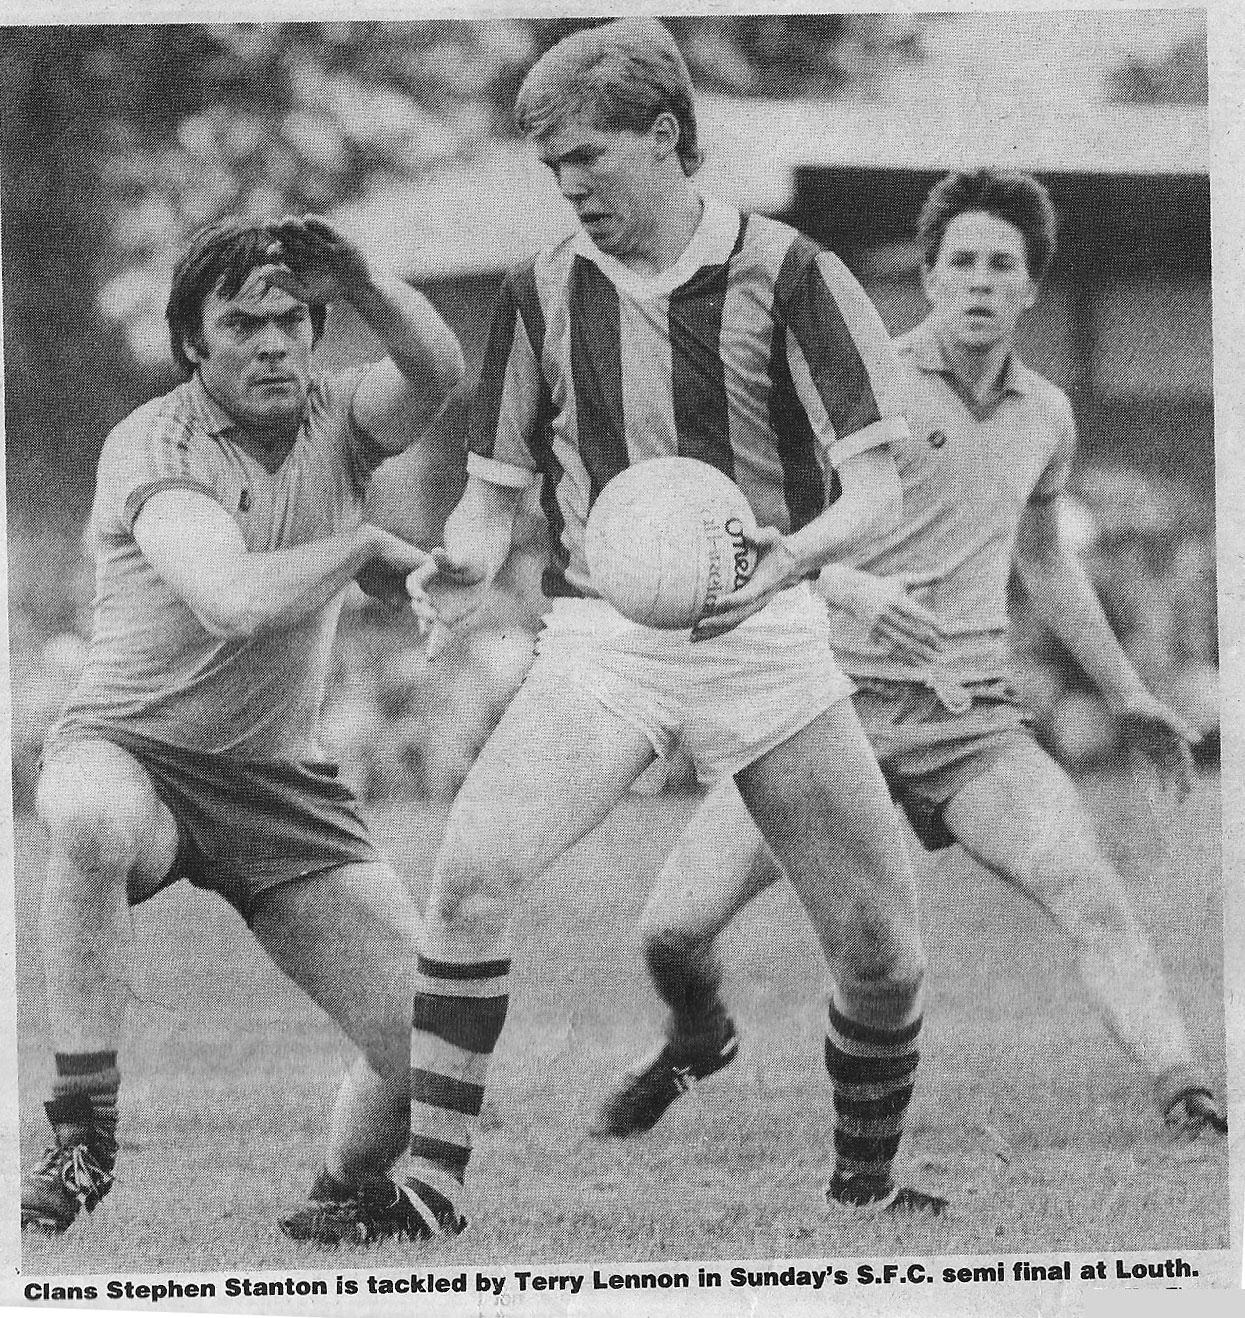 Stephen Staunton, Clans GFC GAA